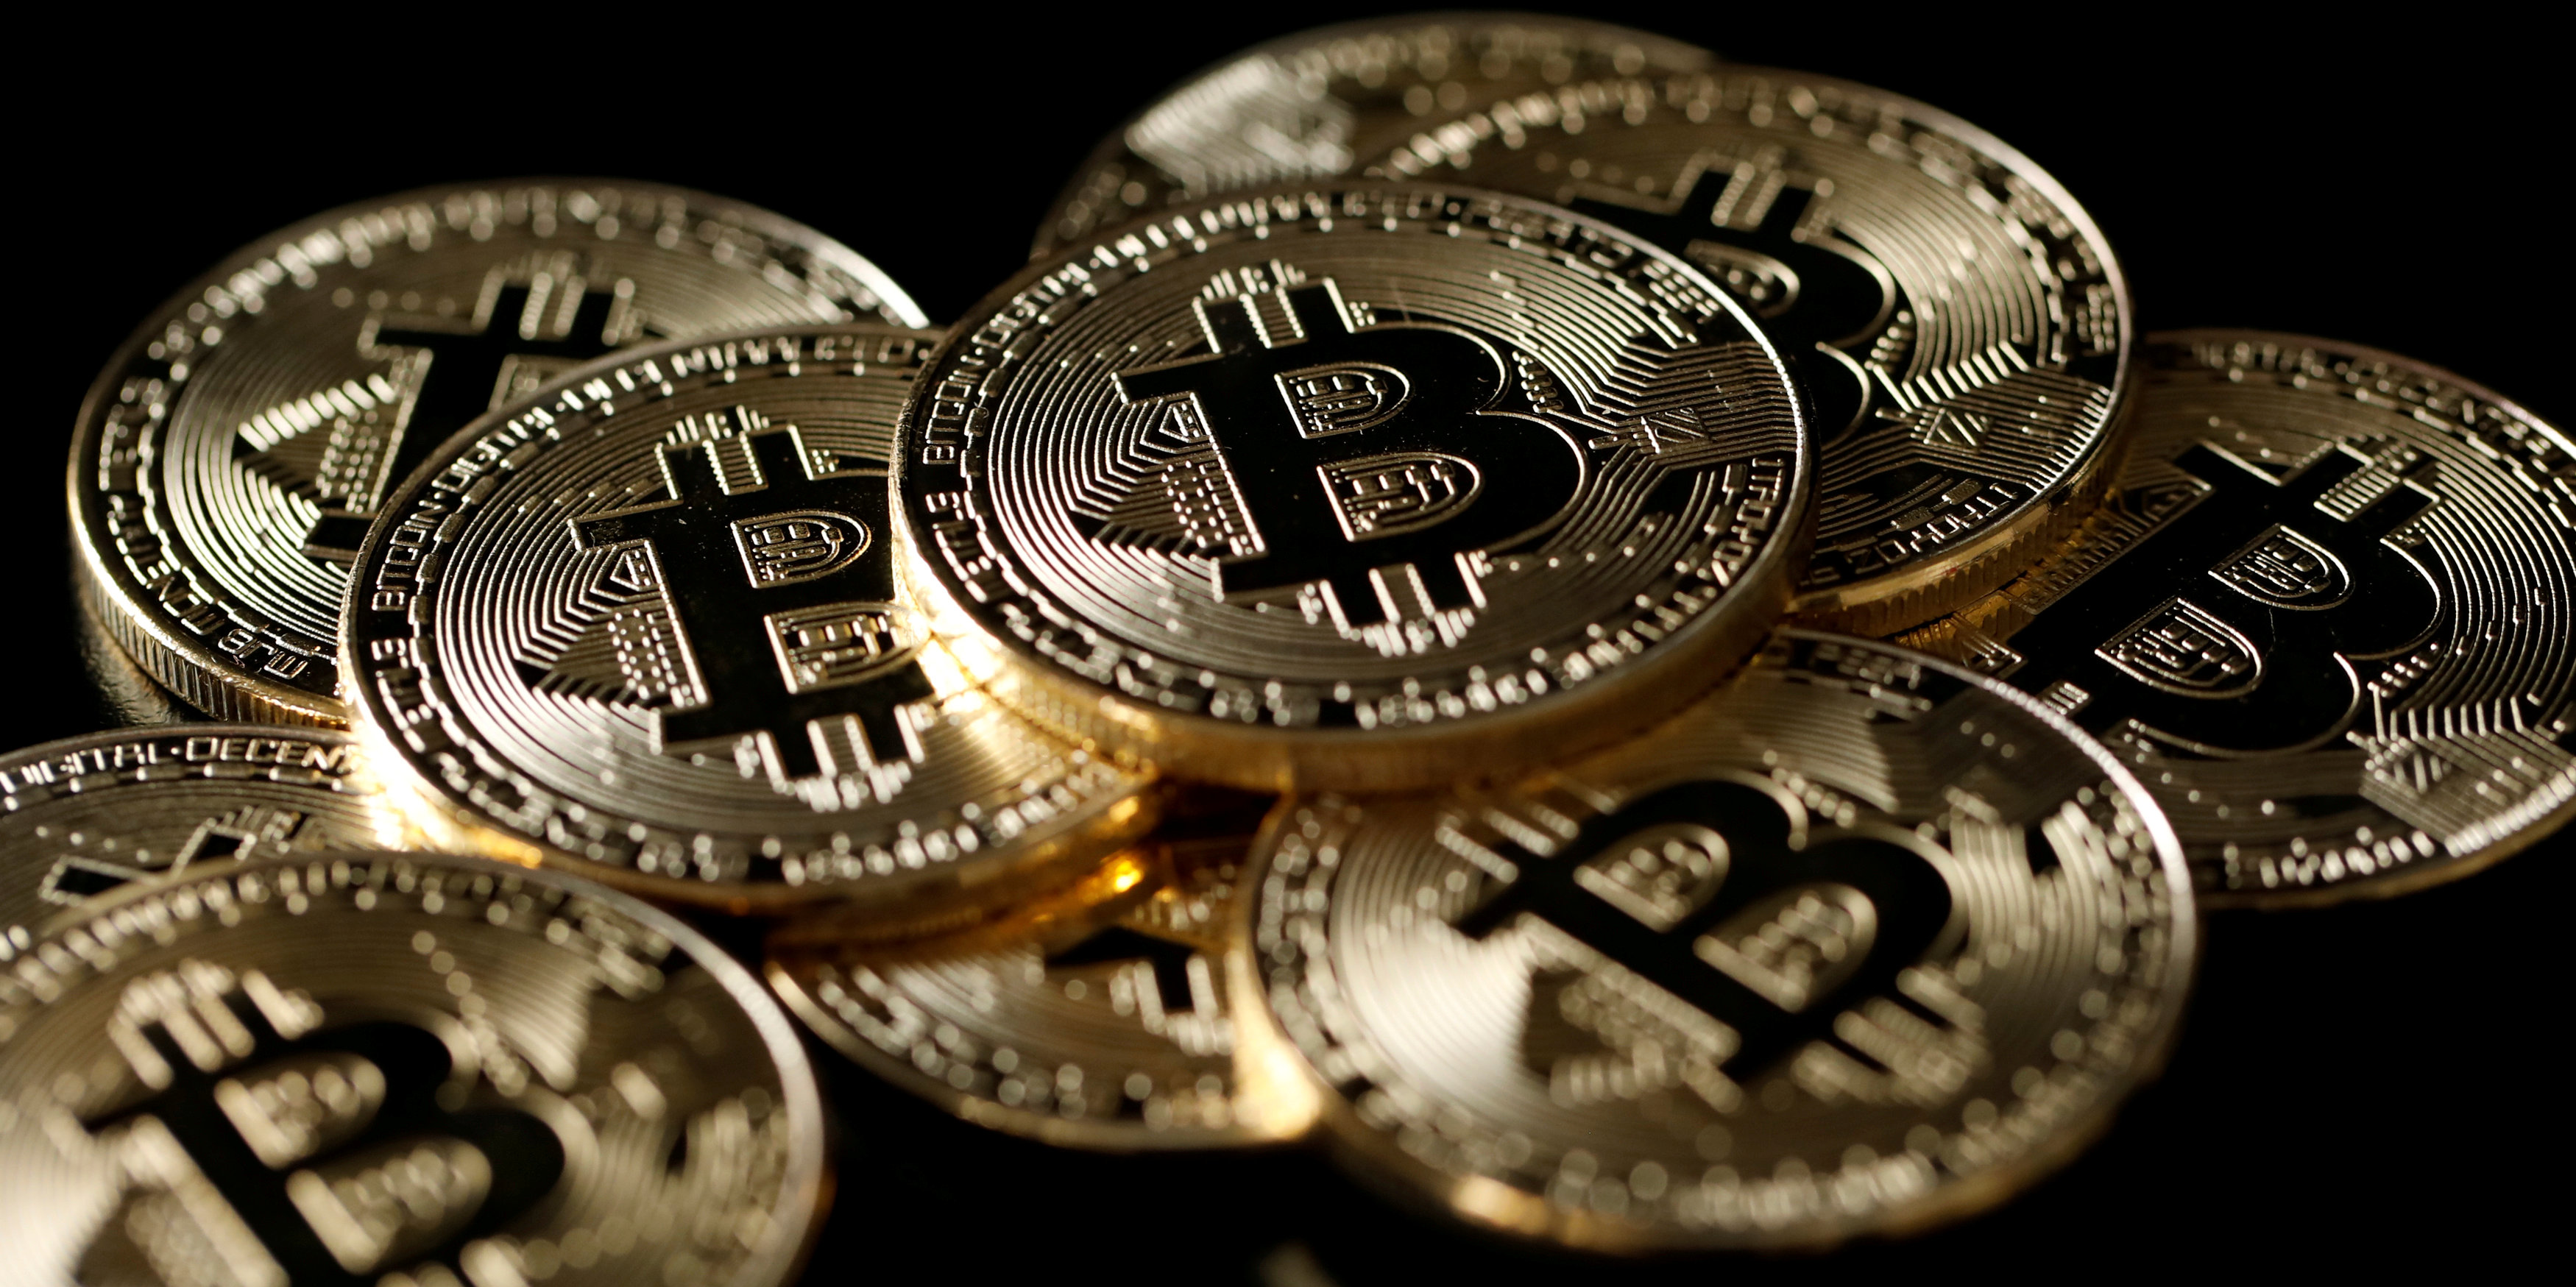 le-bitcoin-chute-l-etau-de-la-reglementation-se-resserre 20181031050619